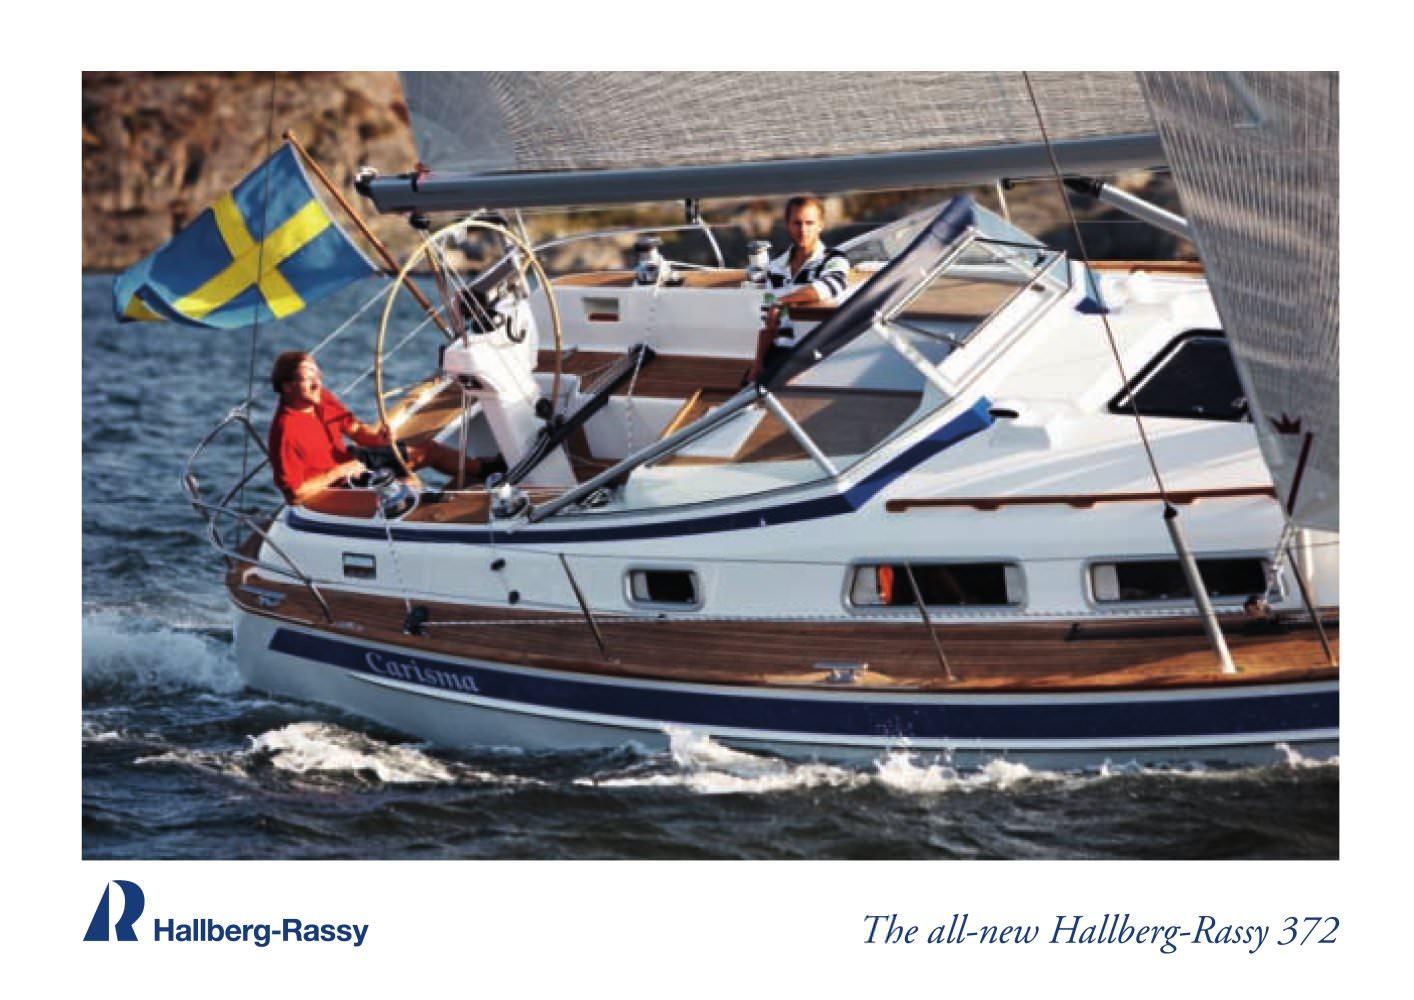 The all-new Hallberg-Rassy 372